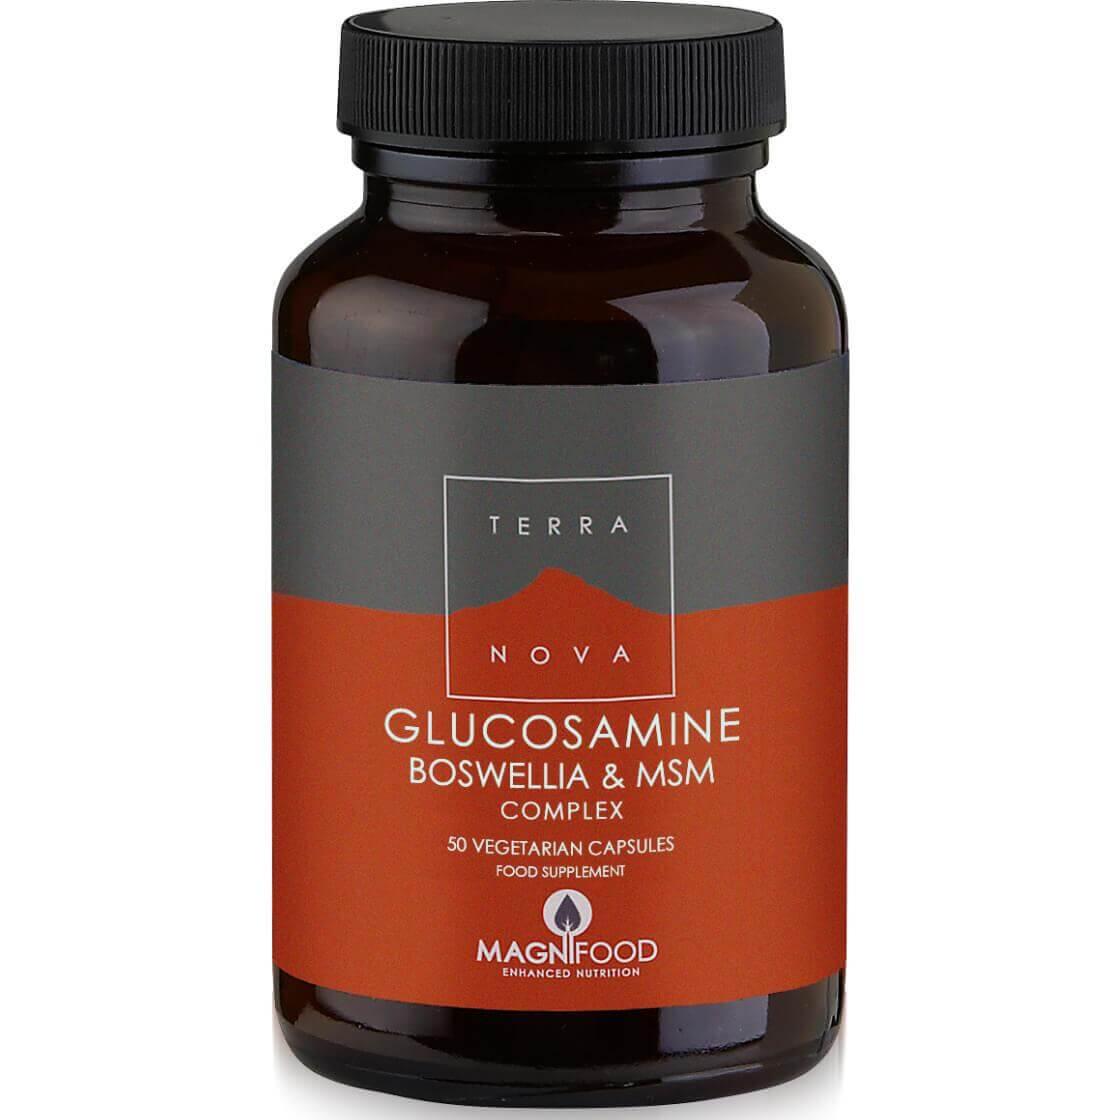 Terranova Glucosamine, Boswellia & ΜSM Complex – Joint Support 100% Φυτική Σύνθεση για τα Προβλήματα των Αρθρώσεων – 50 veg.caps